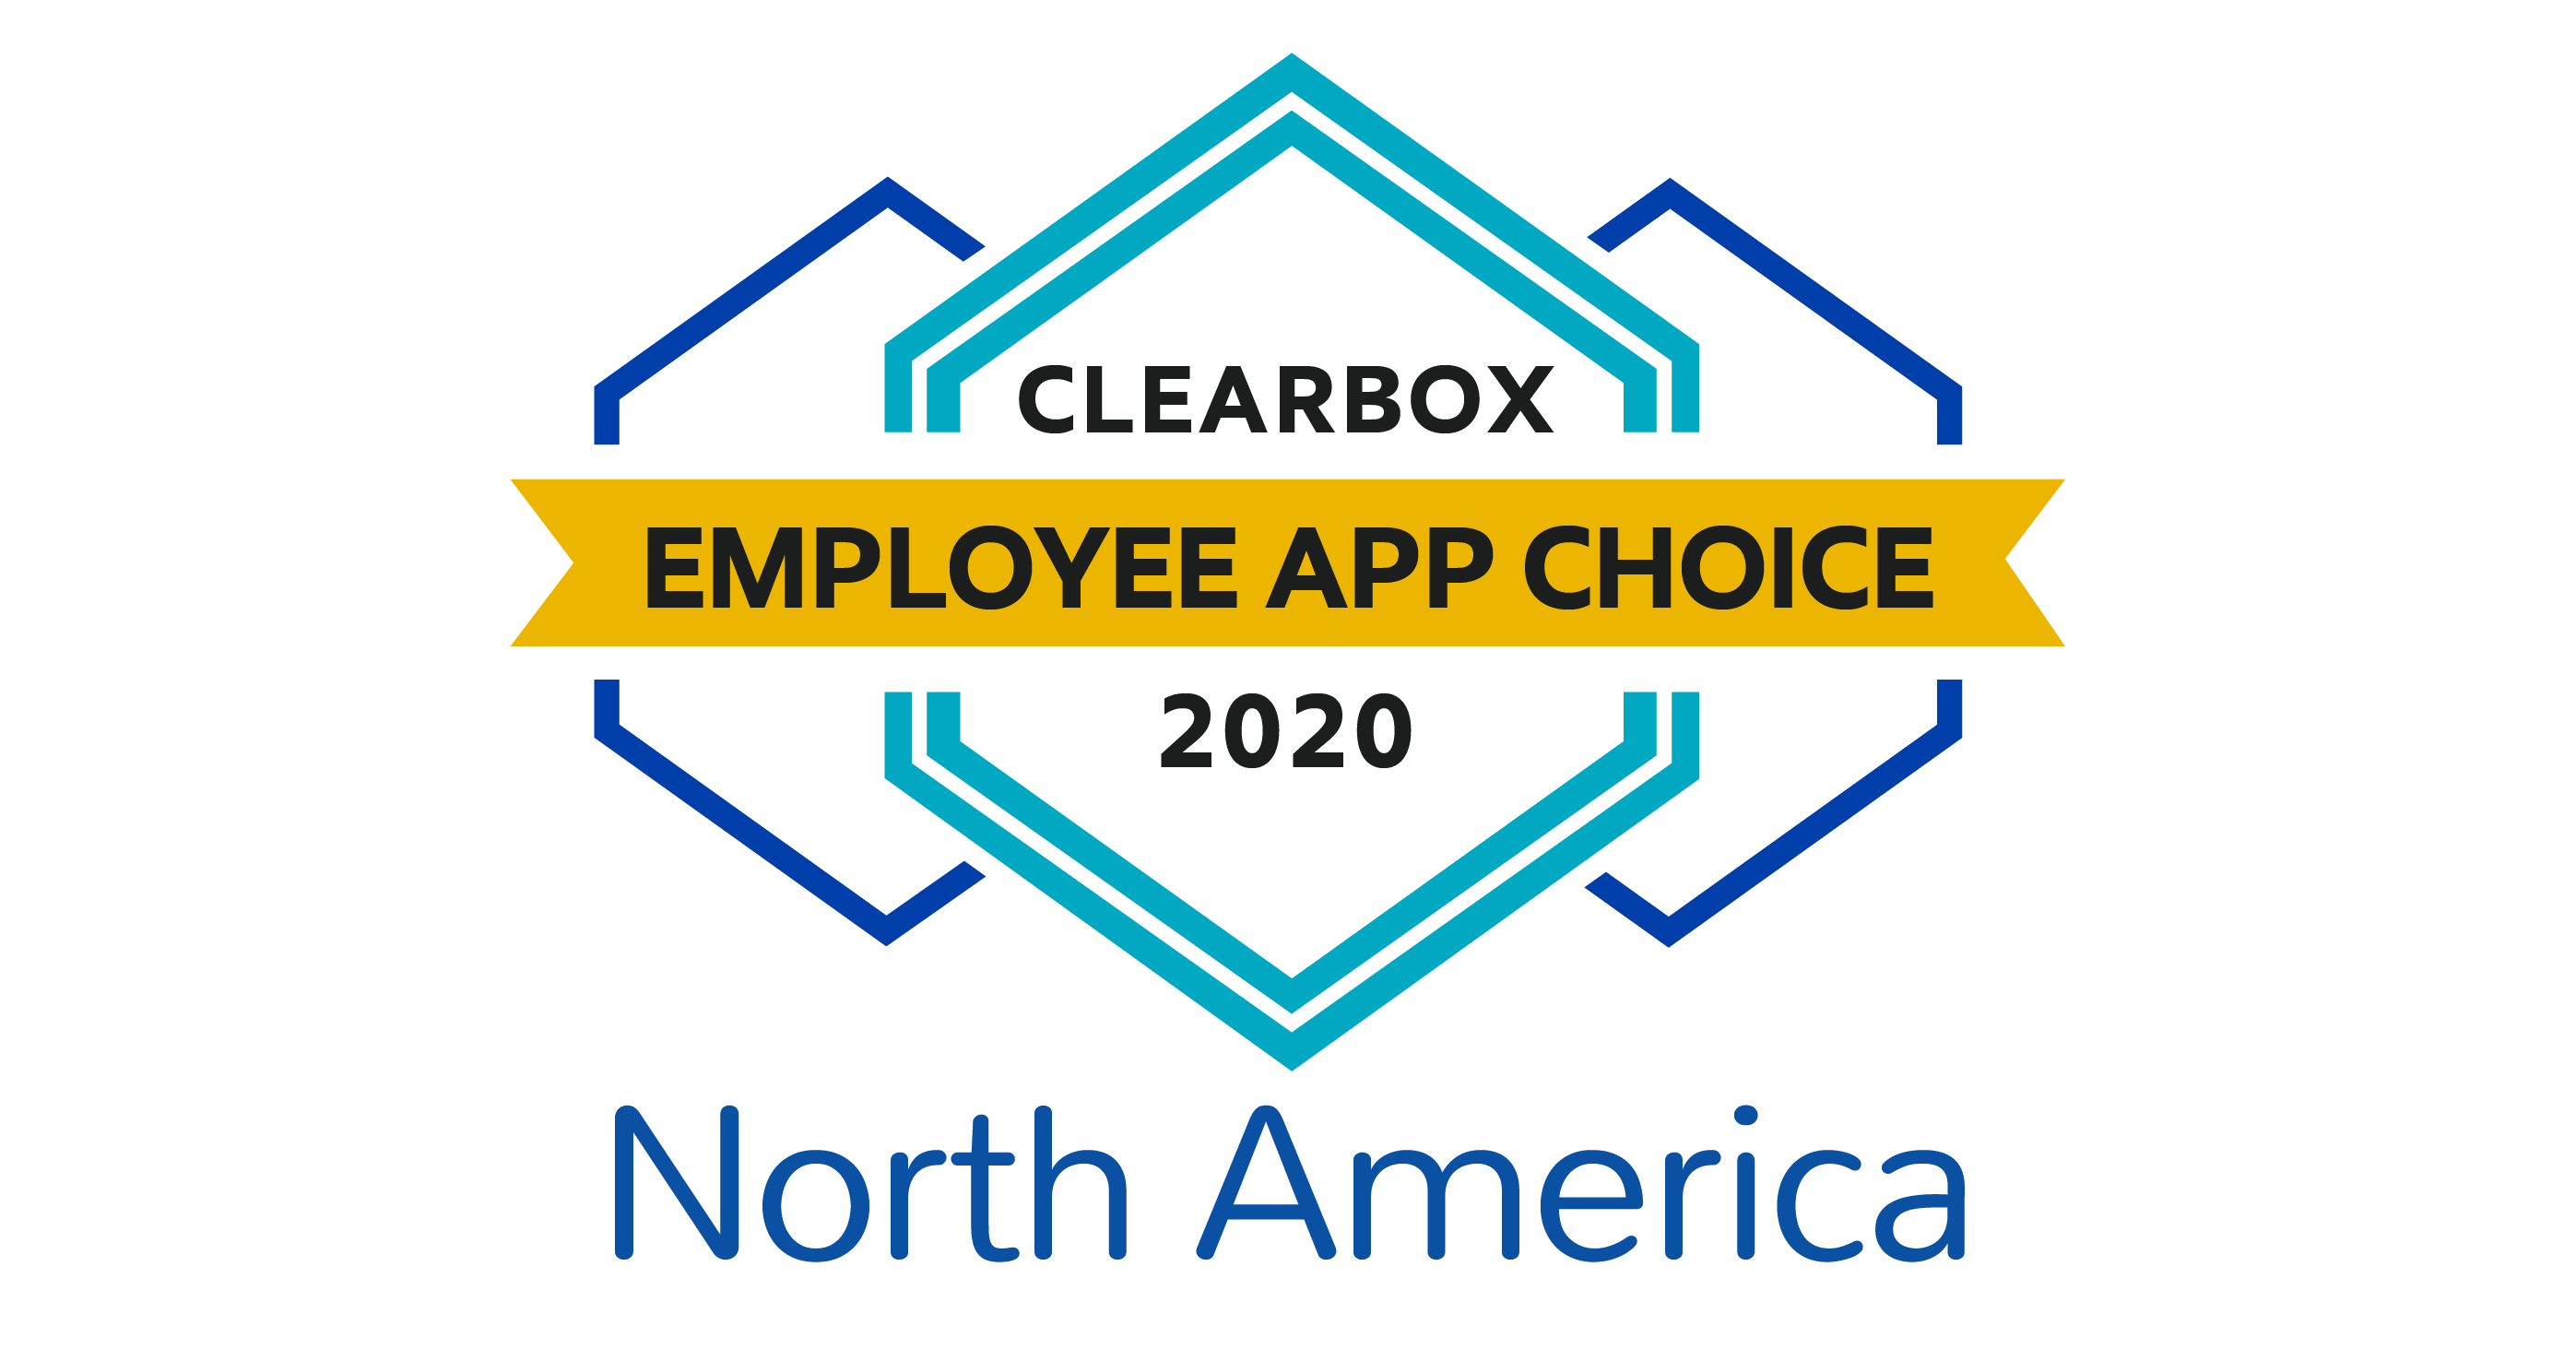 Employee app choice North America 2020.